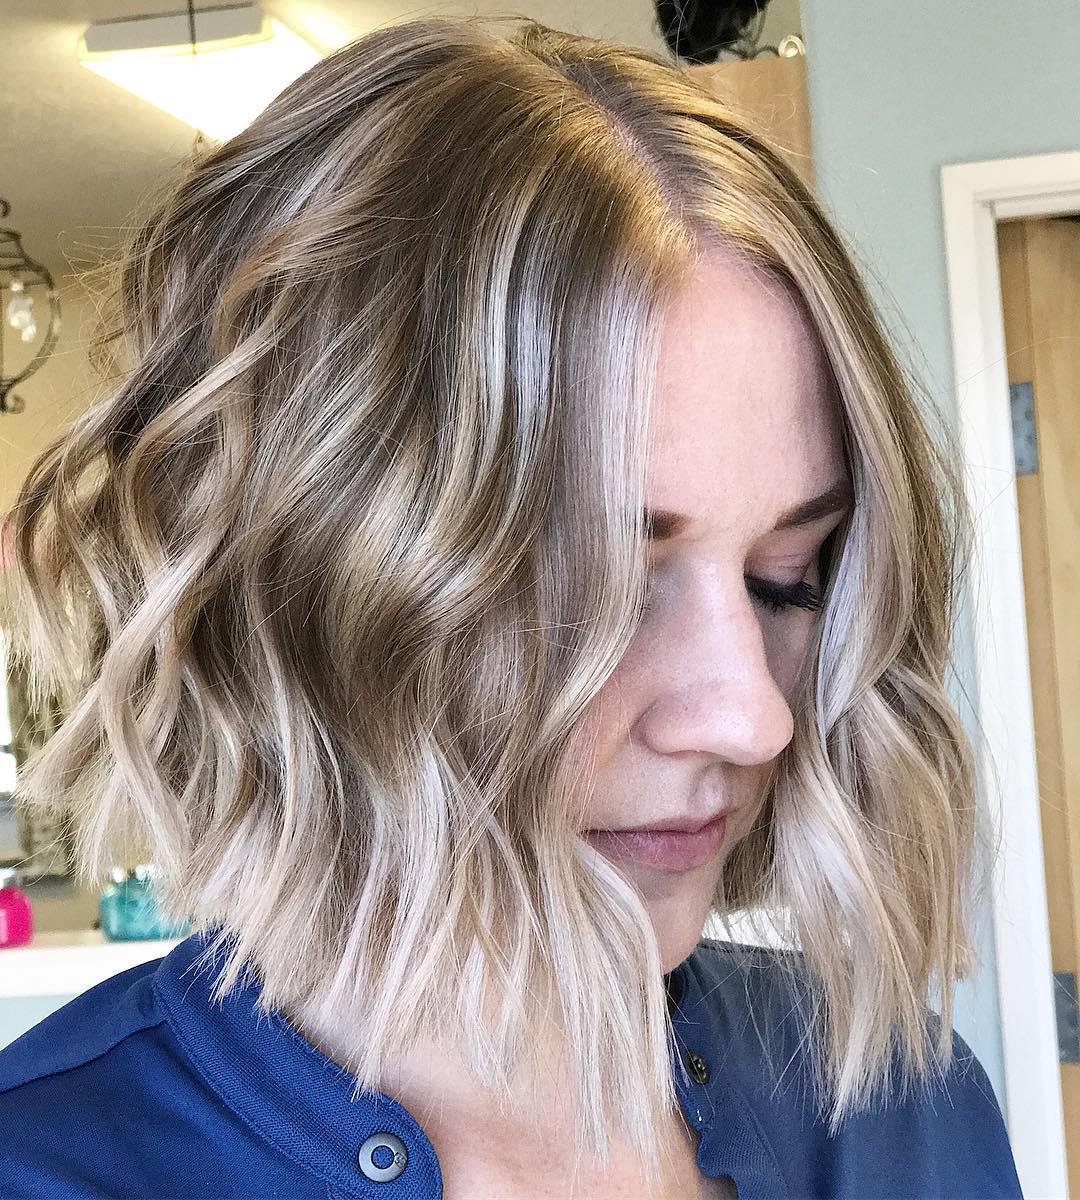 Simple-easy-bob-hairstyle-4 Modern Bob Hairstyles for 2019 – Best Bob Haircut Ideas